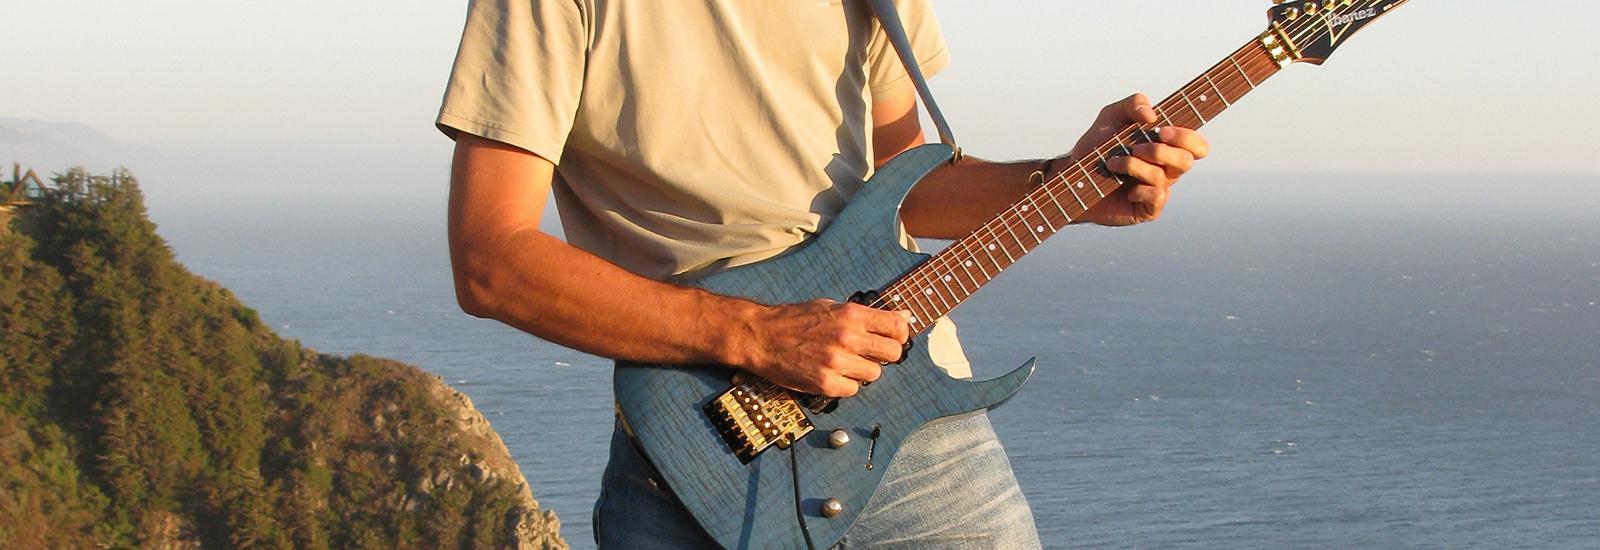 Apprendre la guitare autrement